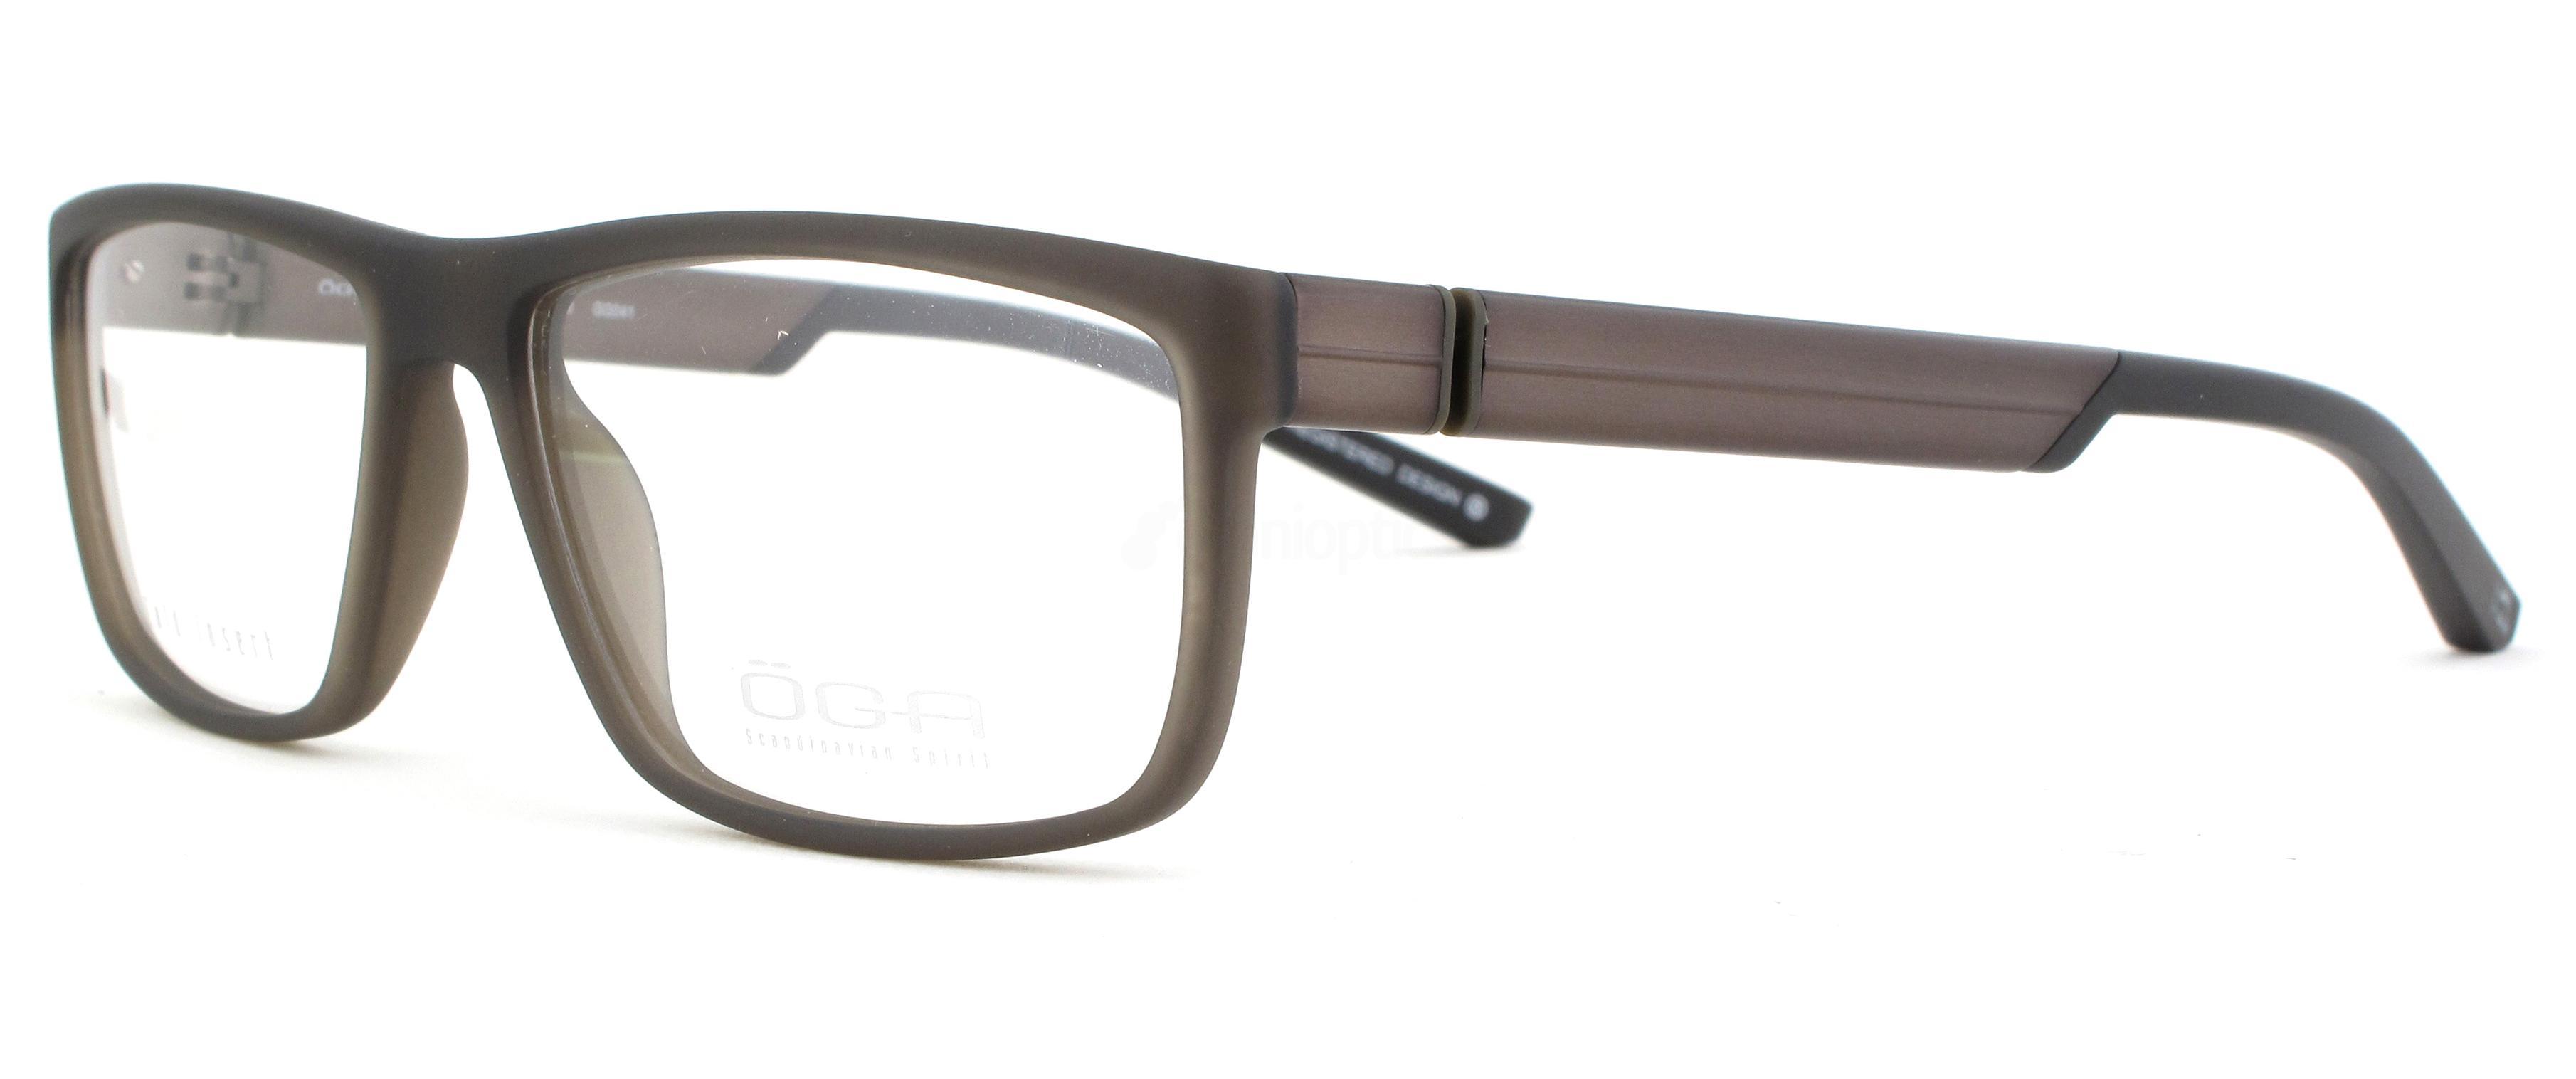 GG041 7652O AVLANG 1 Glasses, ÖGA Scandinavian Spirit